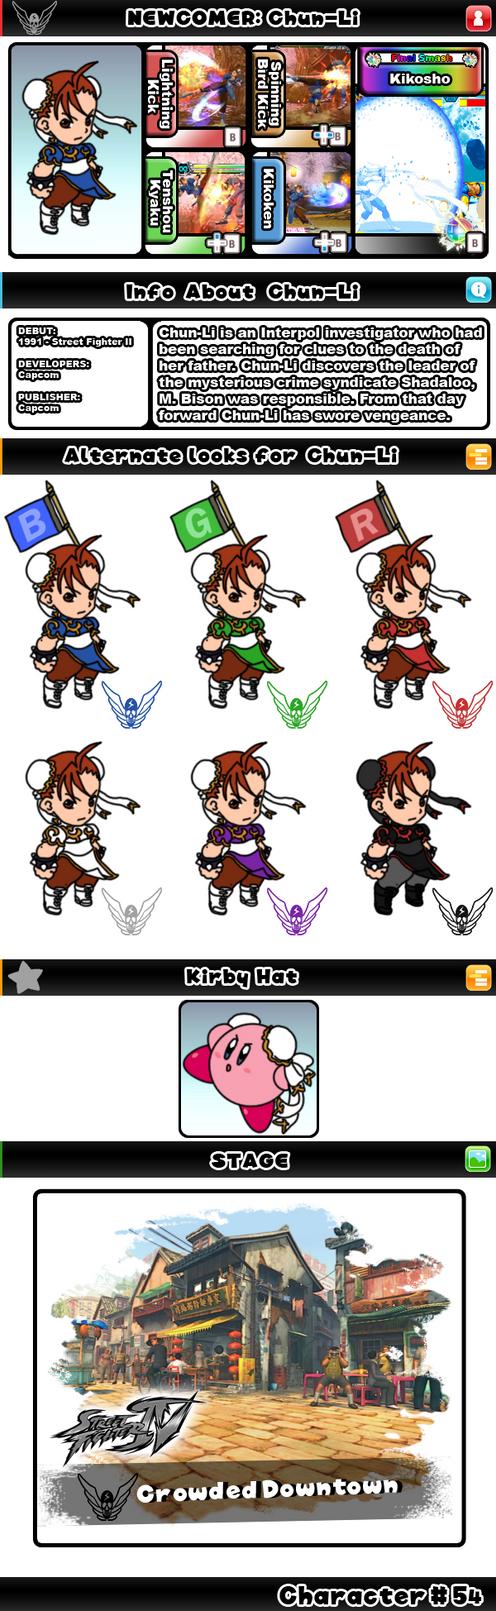 Newcomer Chun-Li by evilwaluigi